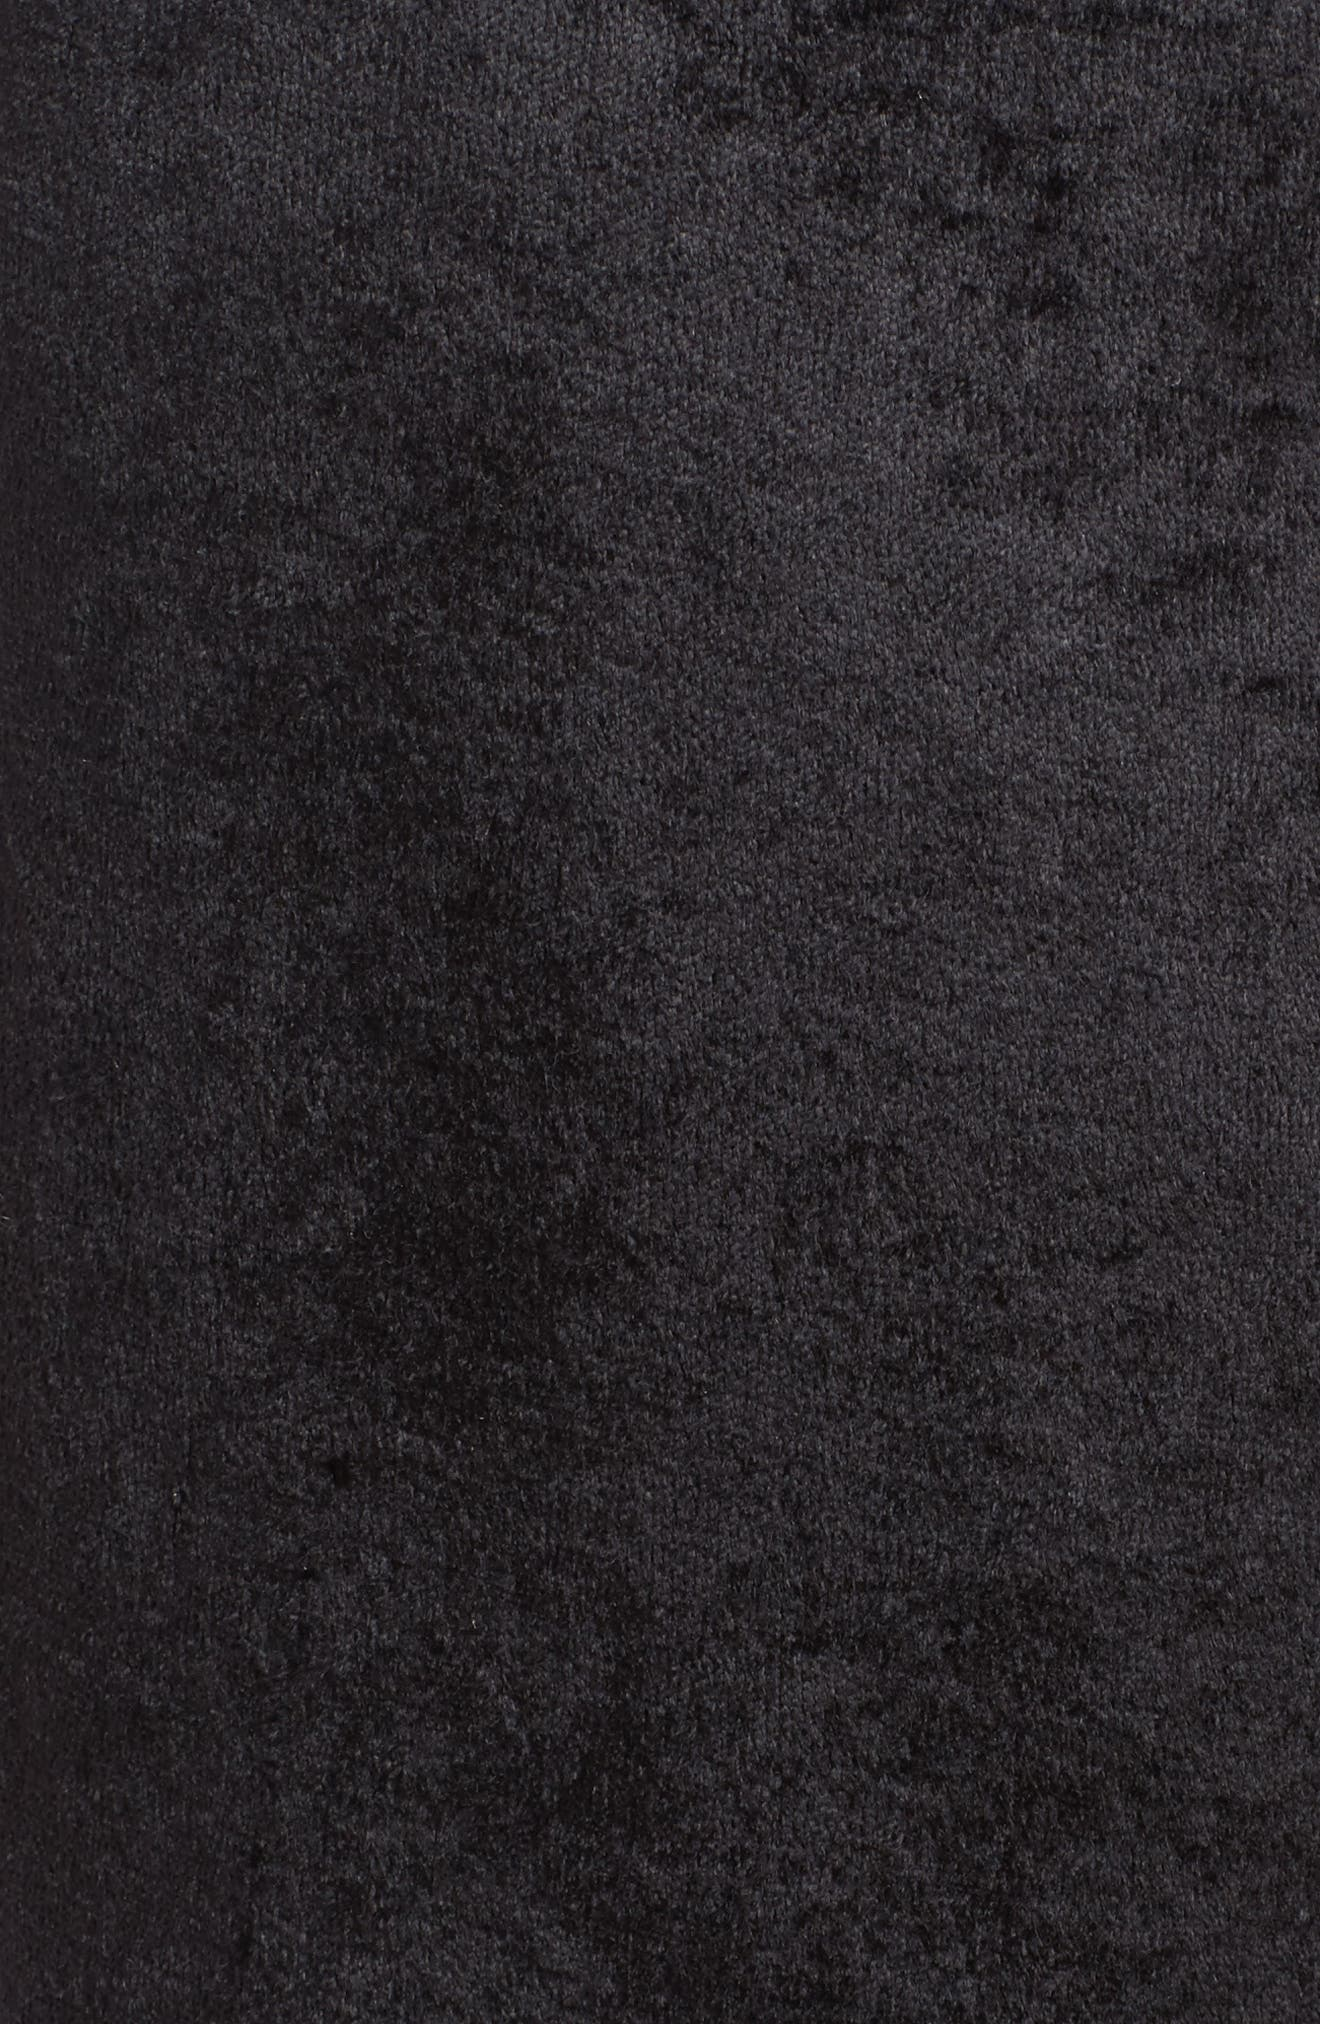 Galaxy Velour Lounge Track Pants,                             Alternate thumbnail 5, color,                             001